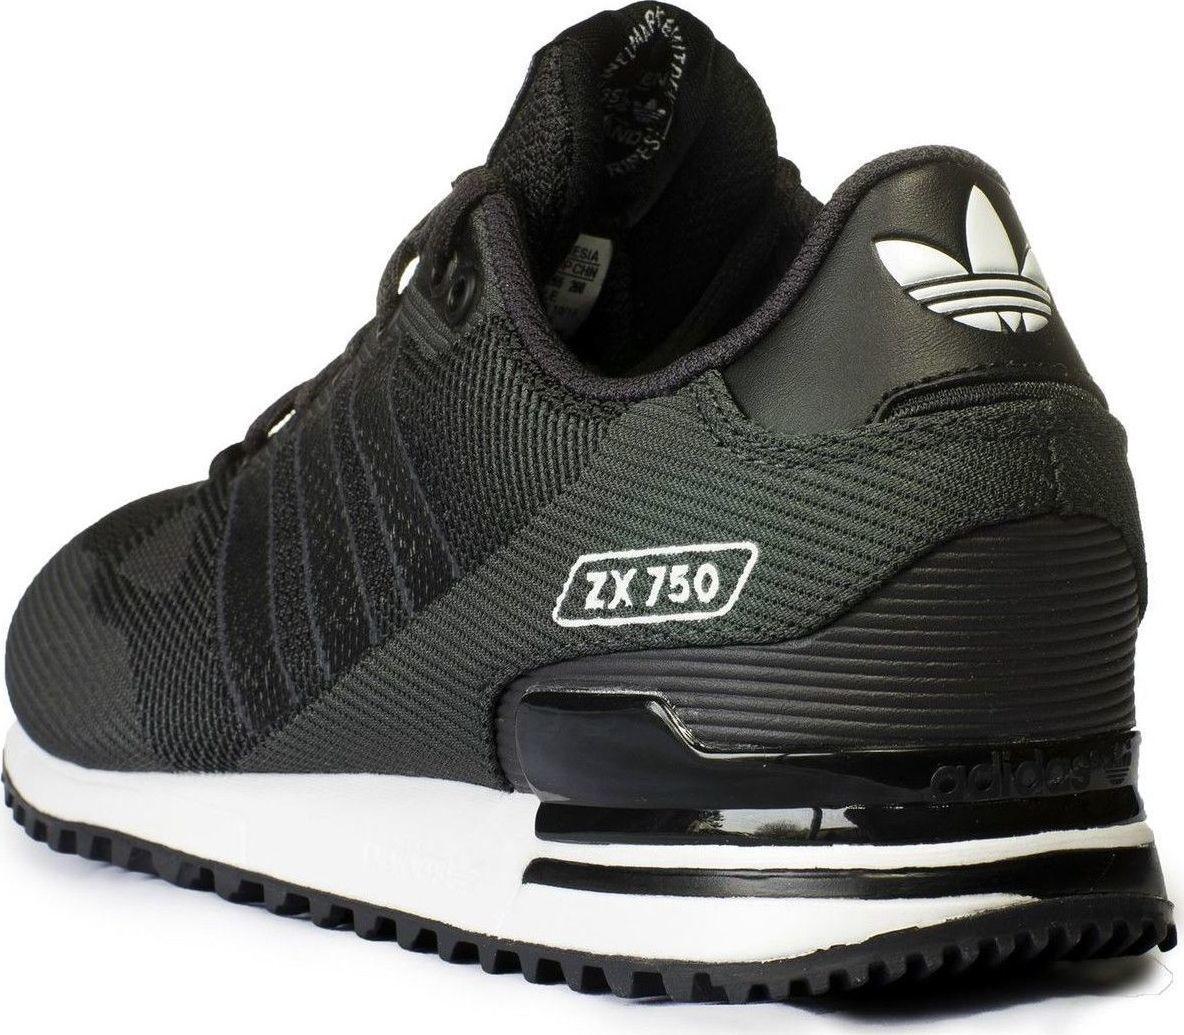 buy online 2b39c c41f4 Adidas ZX 750  Adidas ZX 750 ...